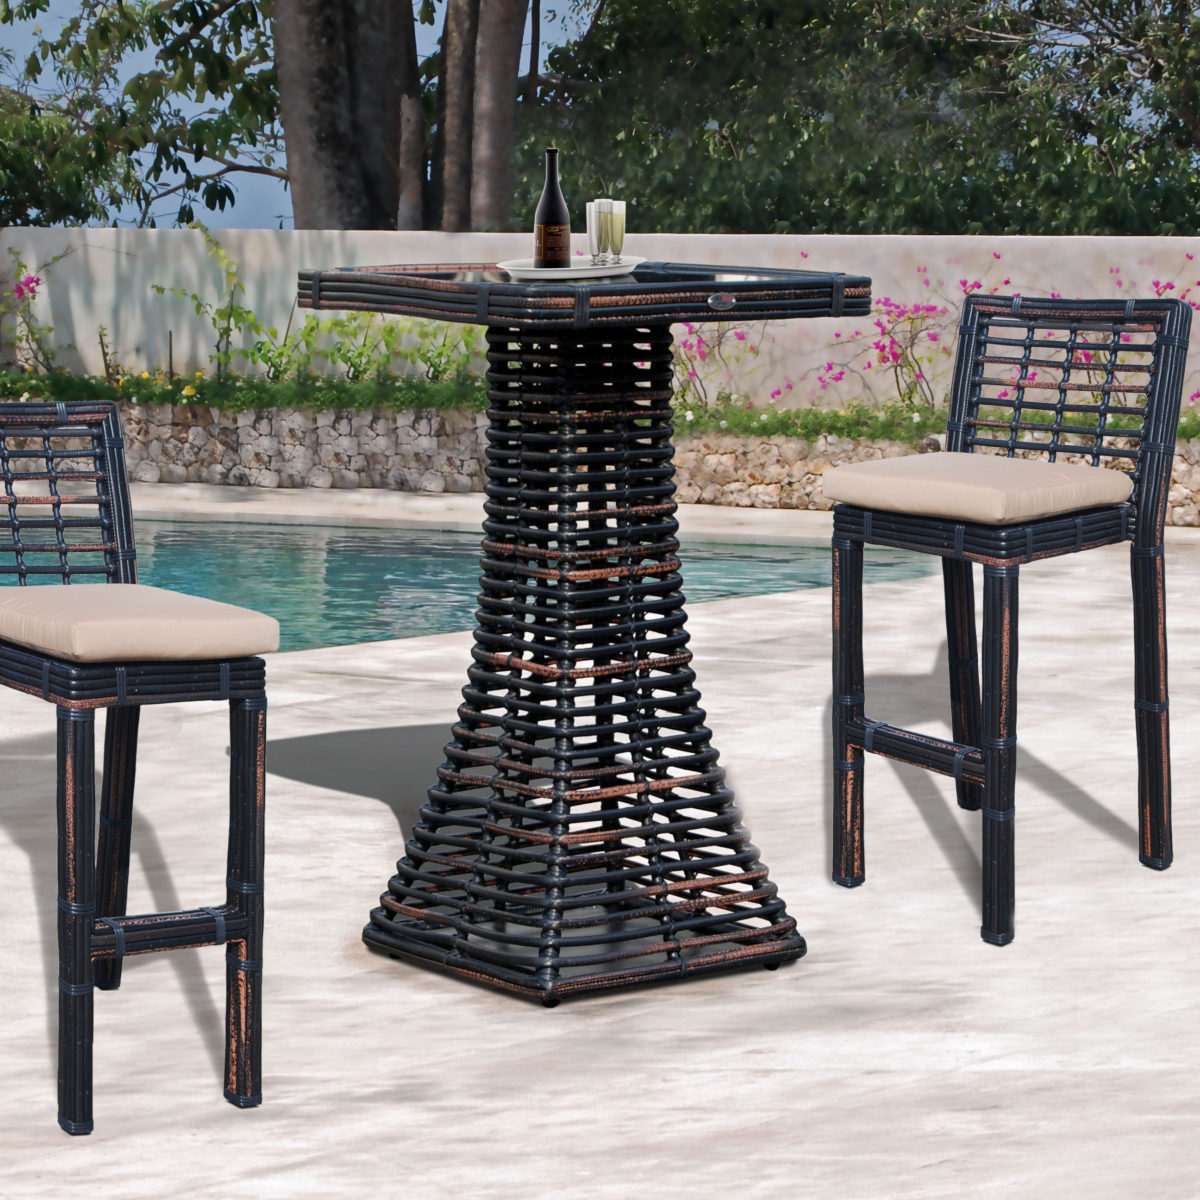 Topaz Sq. Bar Table & Stools - BMNP sq